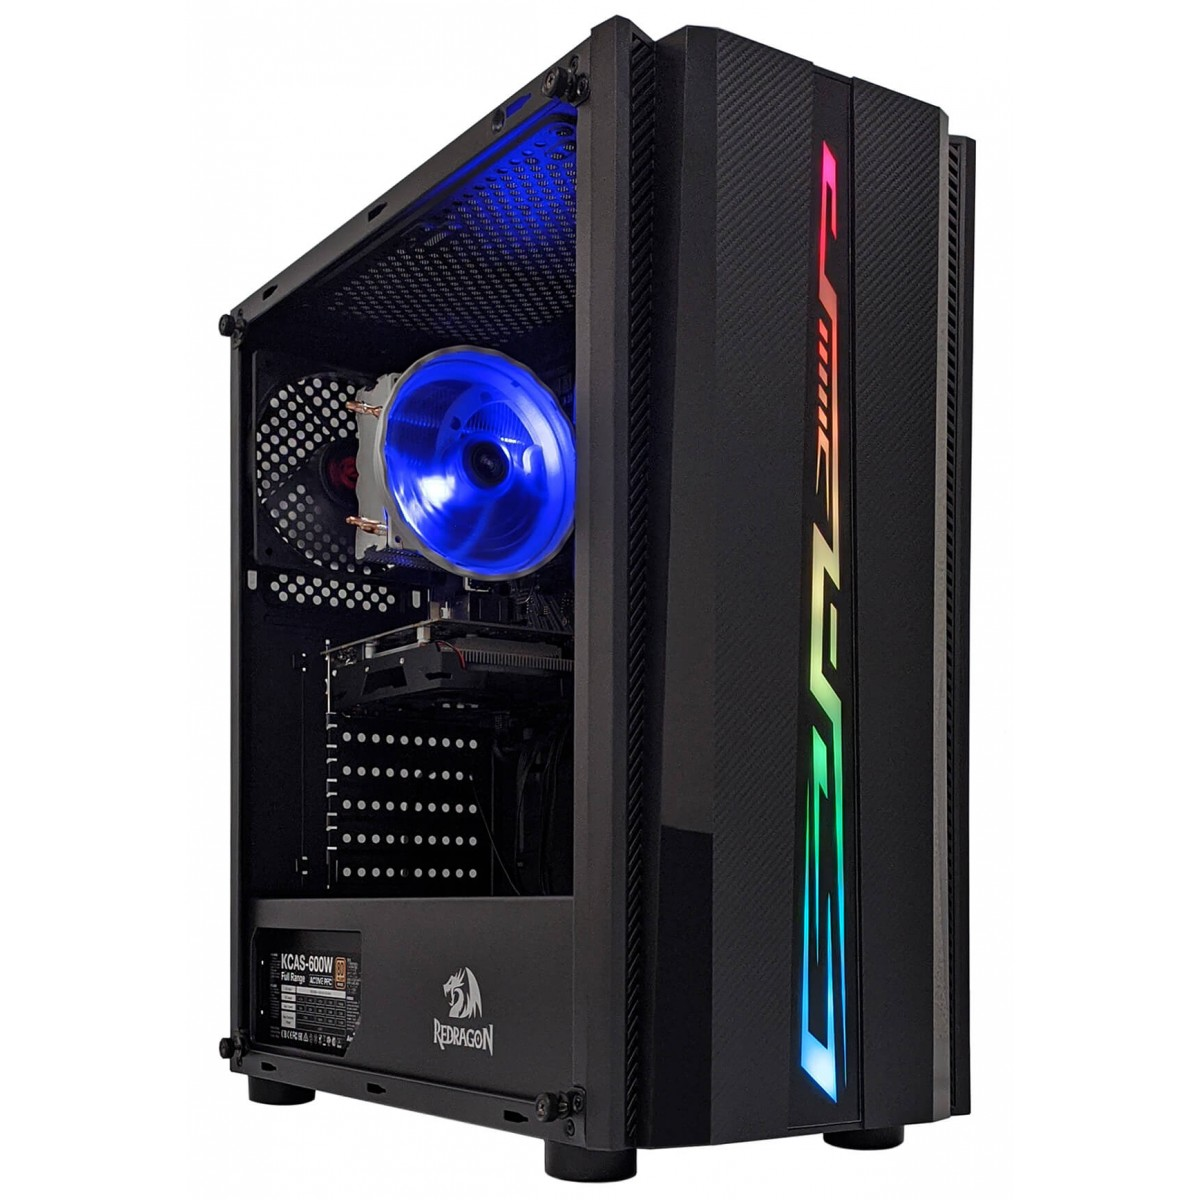 PC Gamer T-MOBA Tiger AMD Ryzen 3 PRO 3200GE / NVIDIA GeForce GTX 1660 Super / DDR4 8GB / SSD 120GB